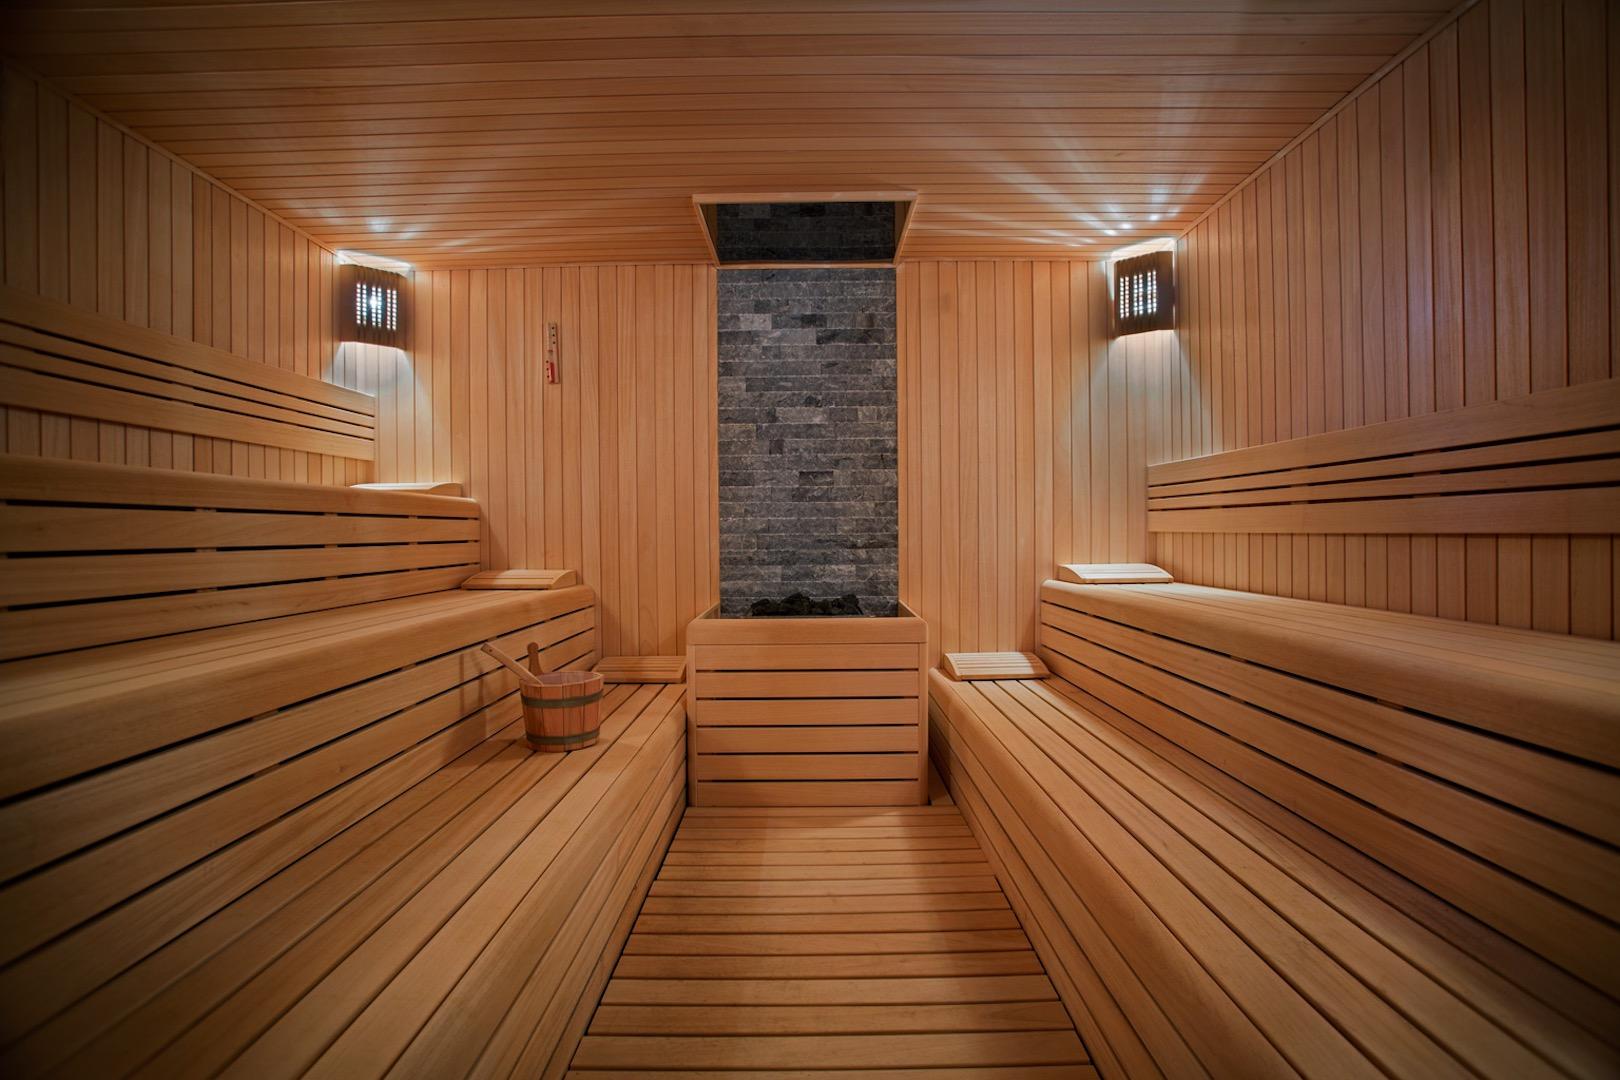 int_opt_Conrad-Sauna.jpg